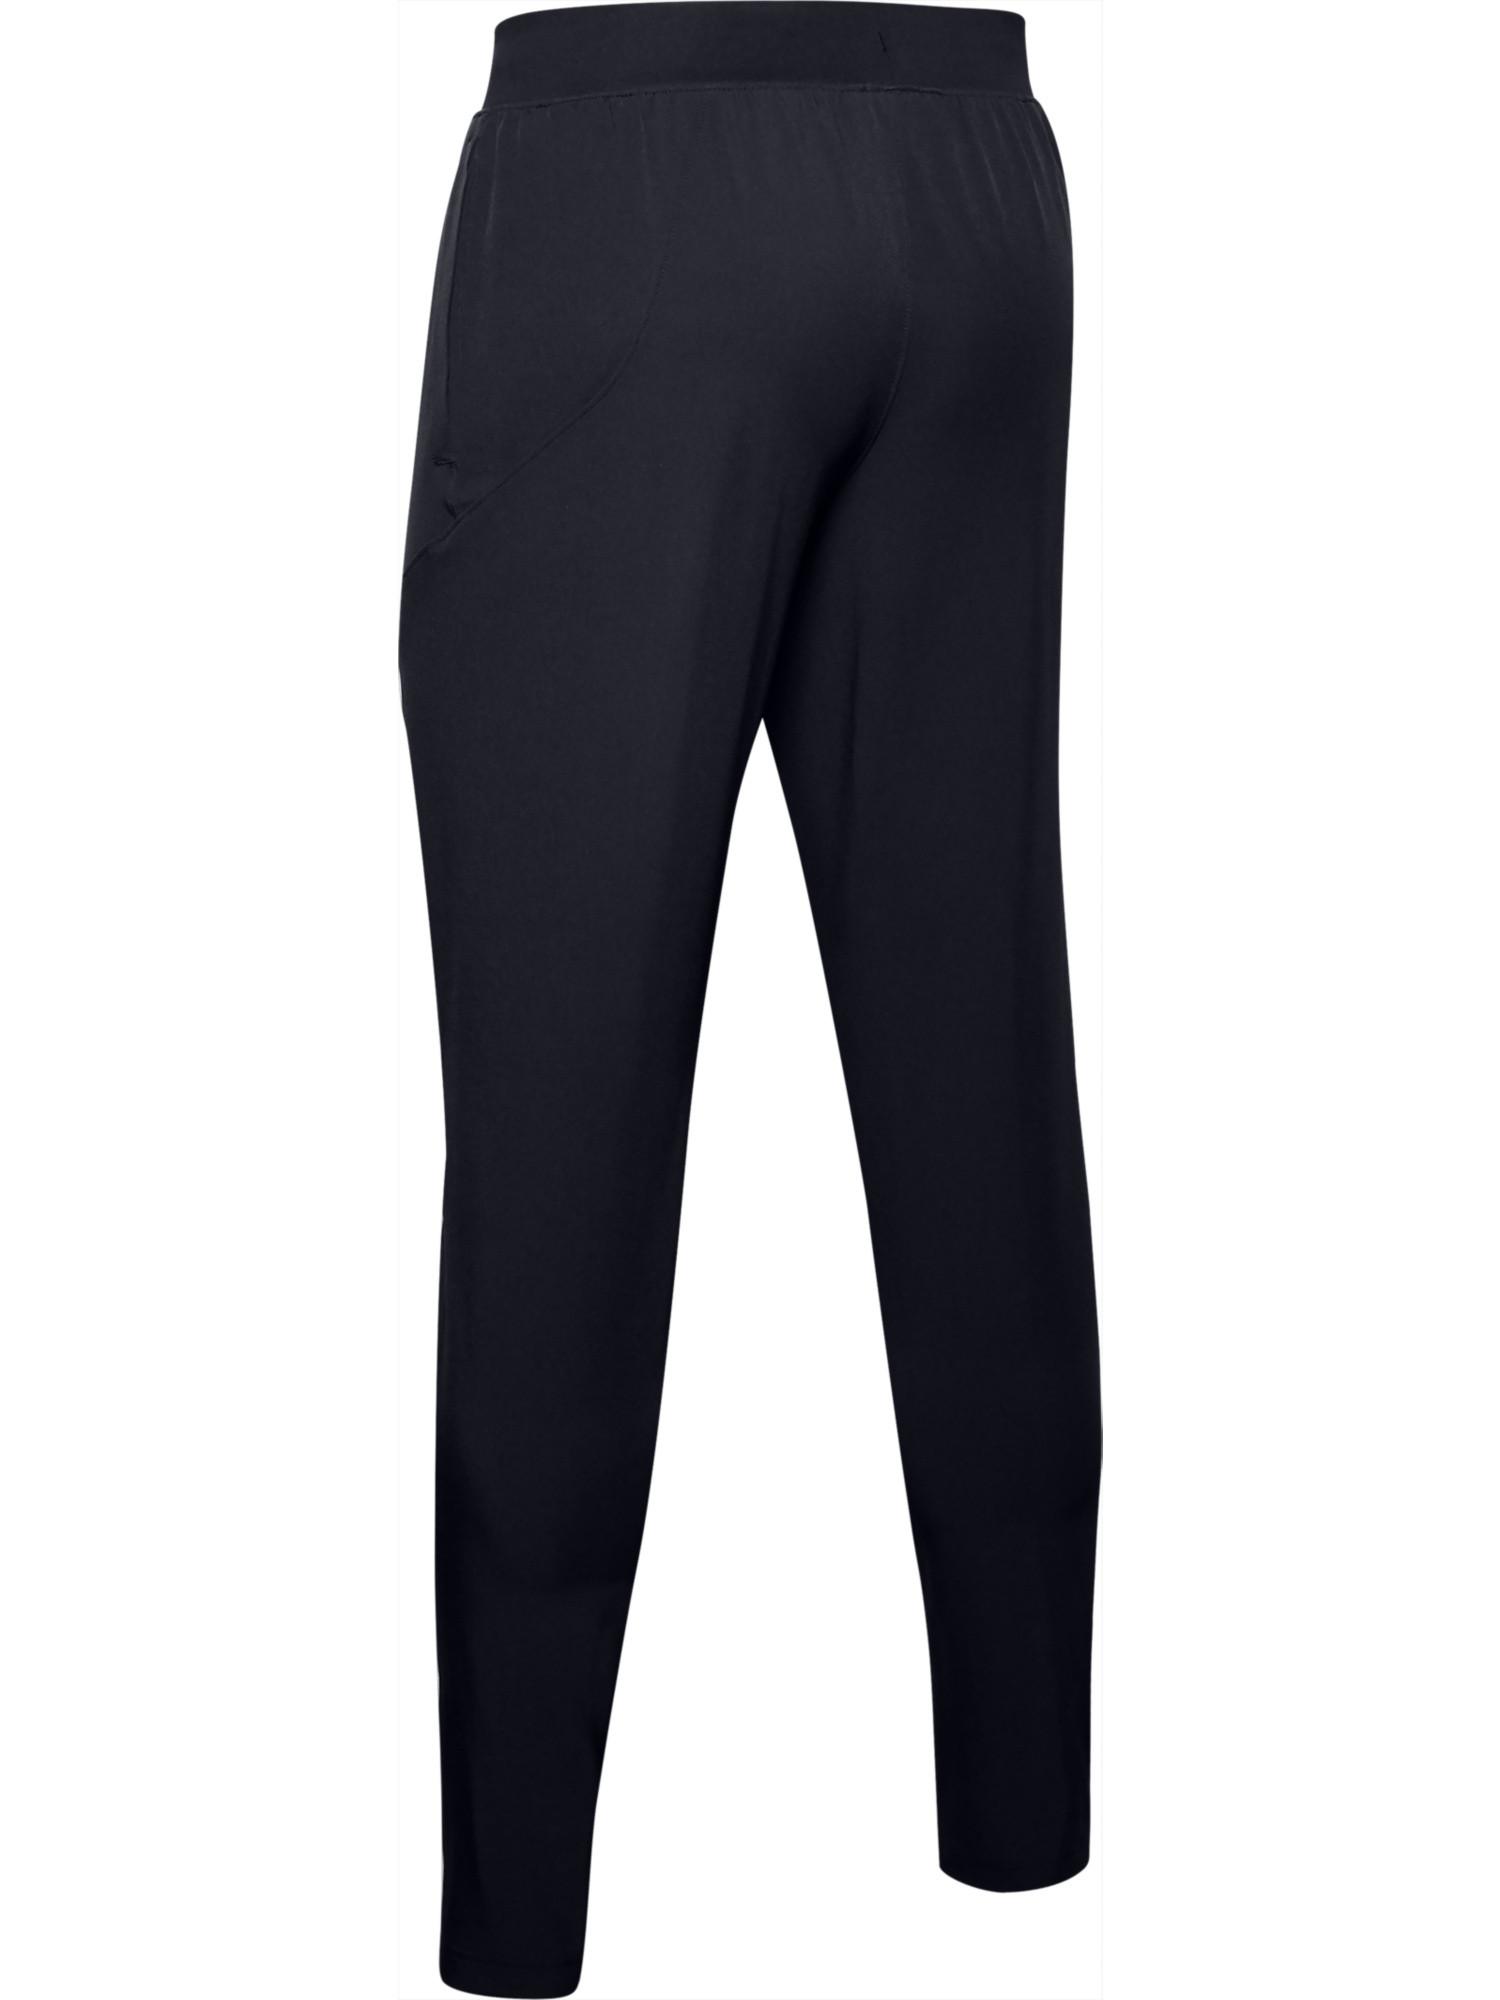 Pantaloni affusolati UA Flex Woven da uomo, Nero, large image number 2